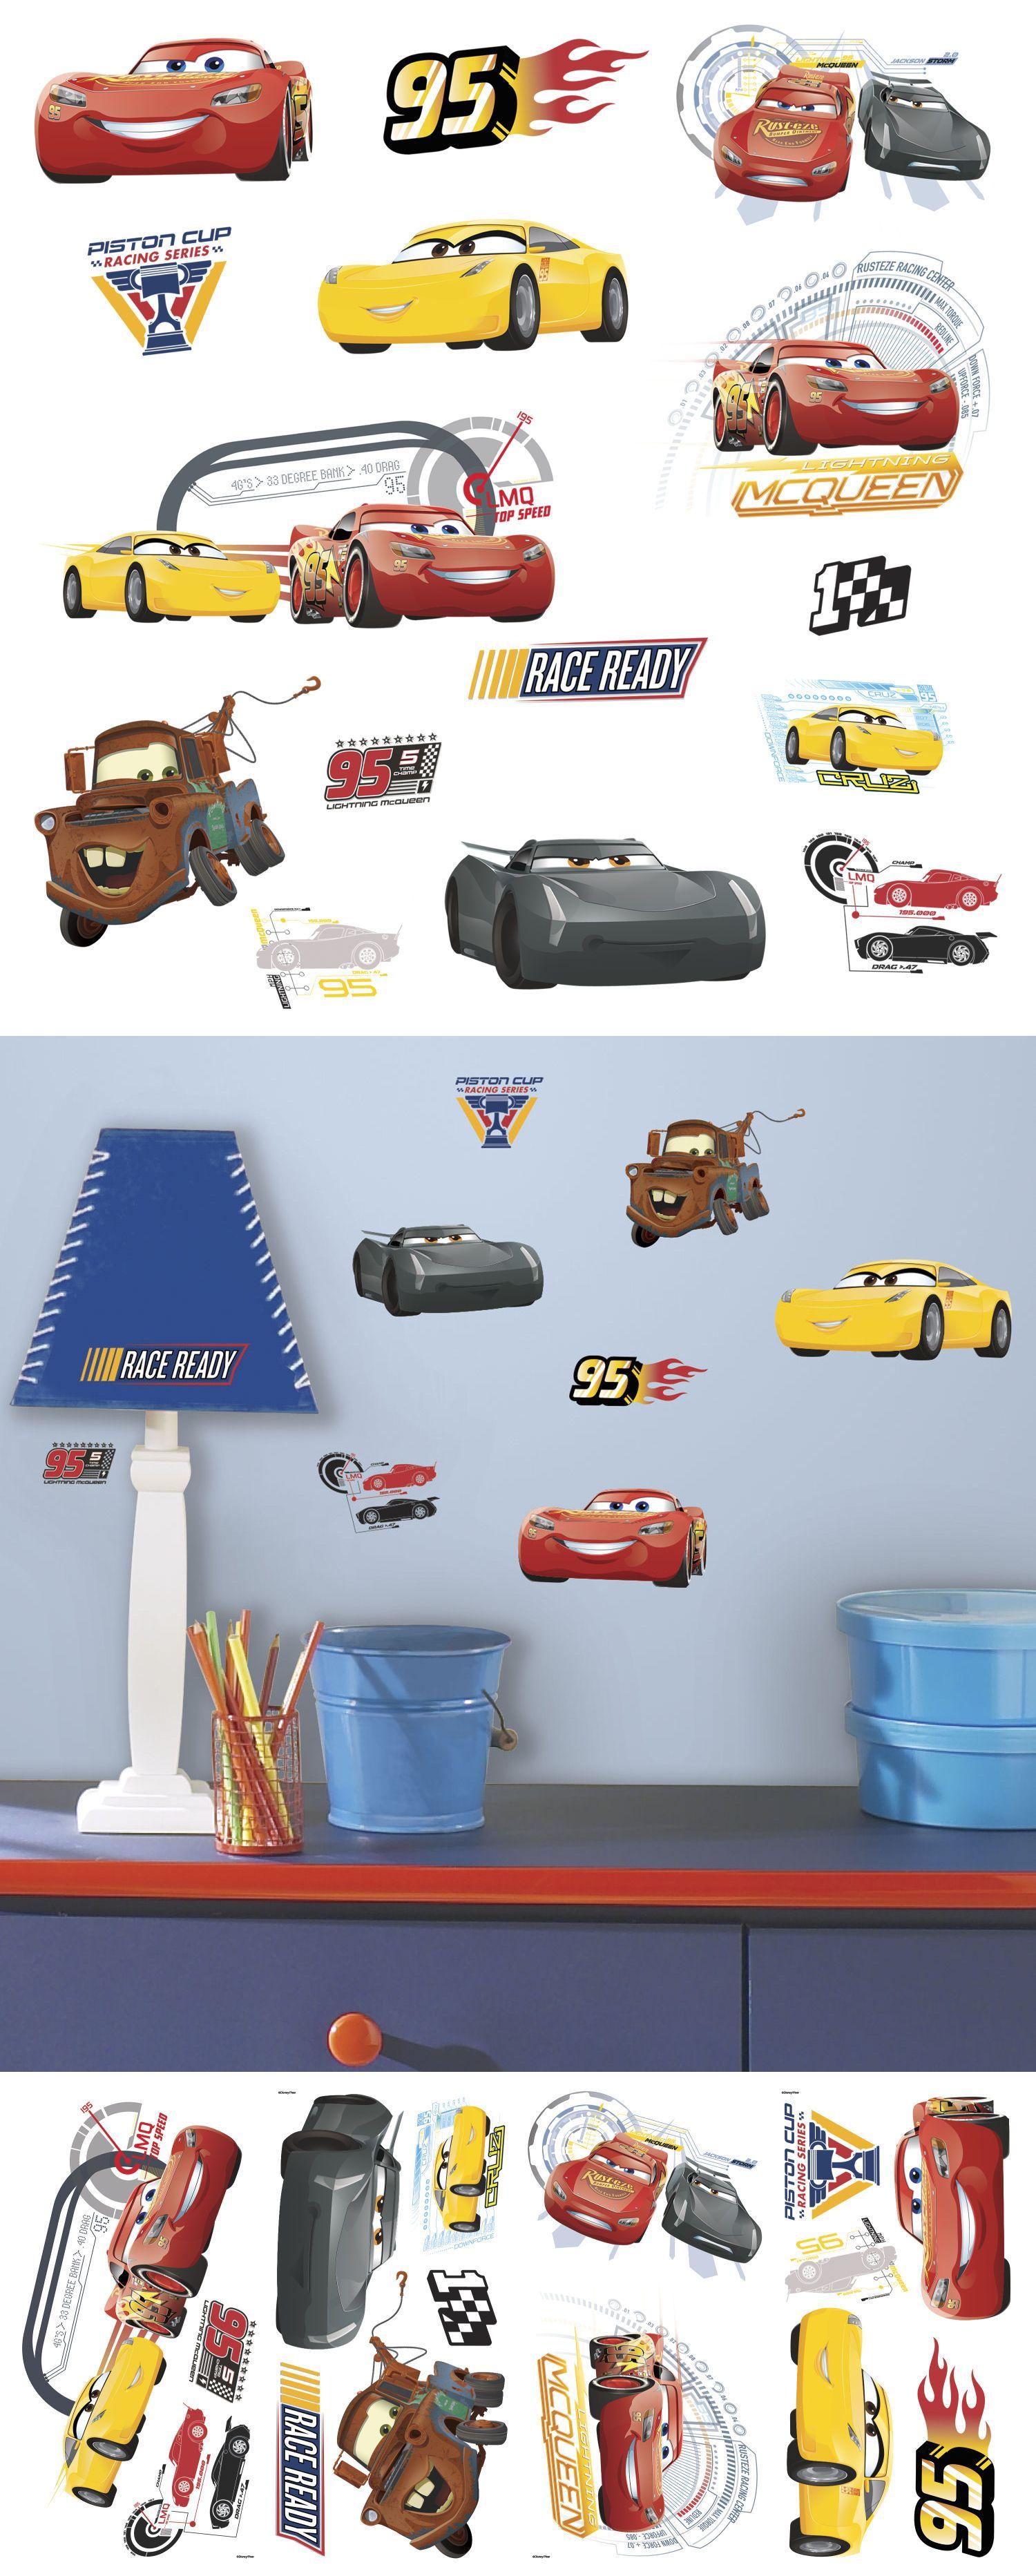 Bedroom Playroom And Dorm D Cor 115970 Disney Cars 3 Movie Wall Decals Lightning Mcqueen Mater Cruz Stickers Room Deco Wall Decals Decor Buy Disney Pixar Cars [ 3730 x 1500 Pixel ]